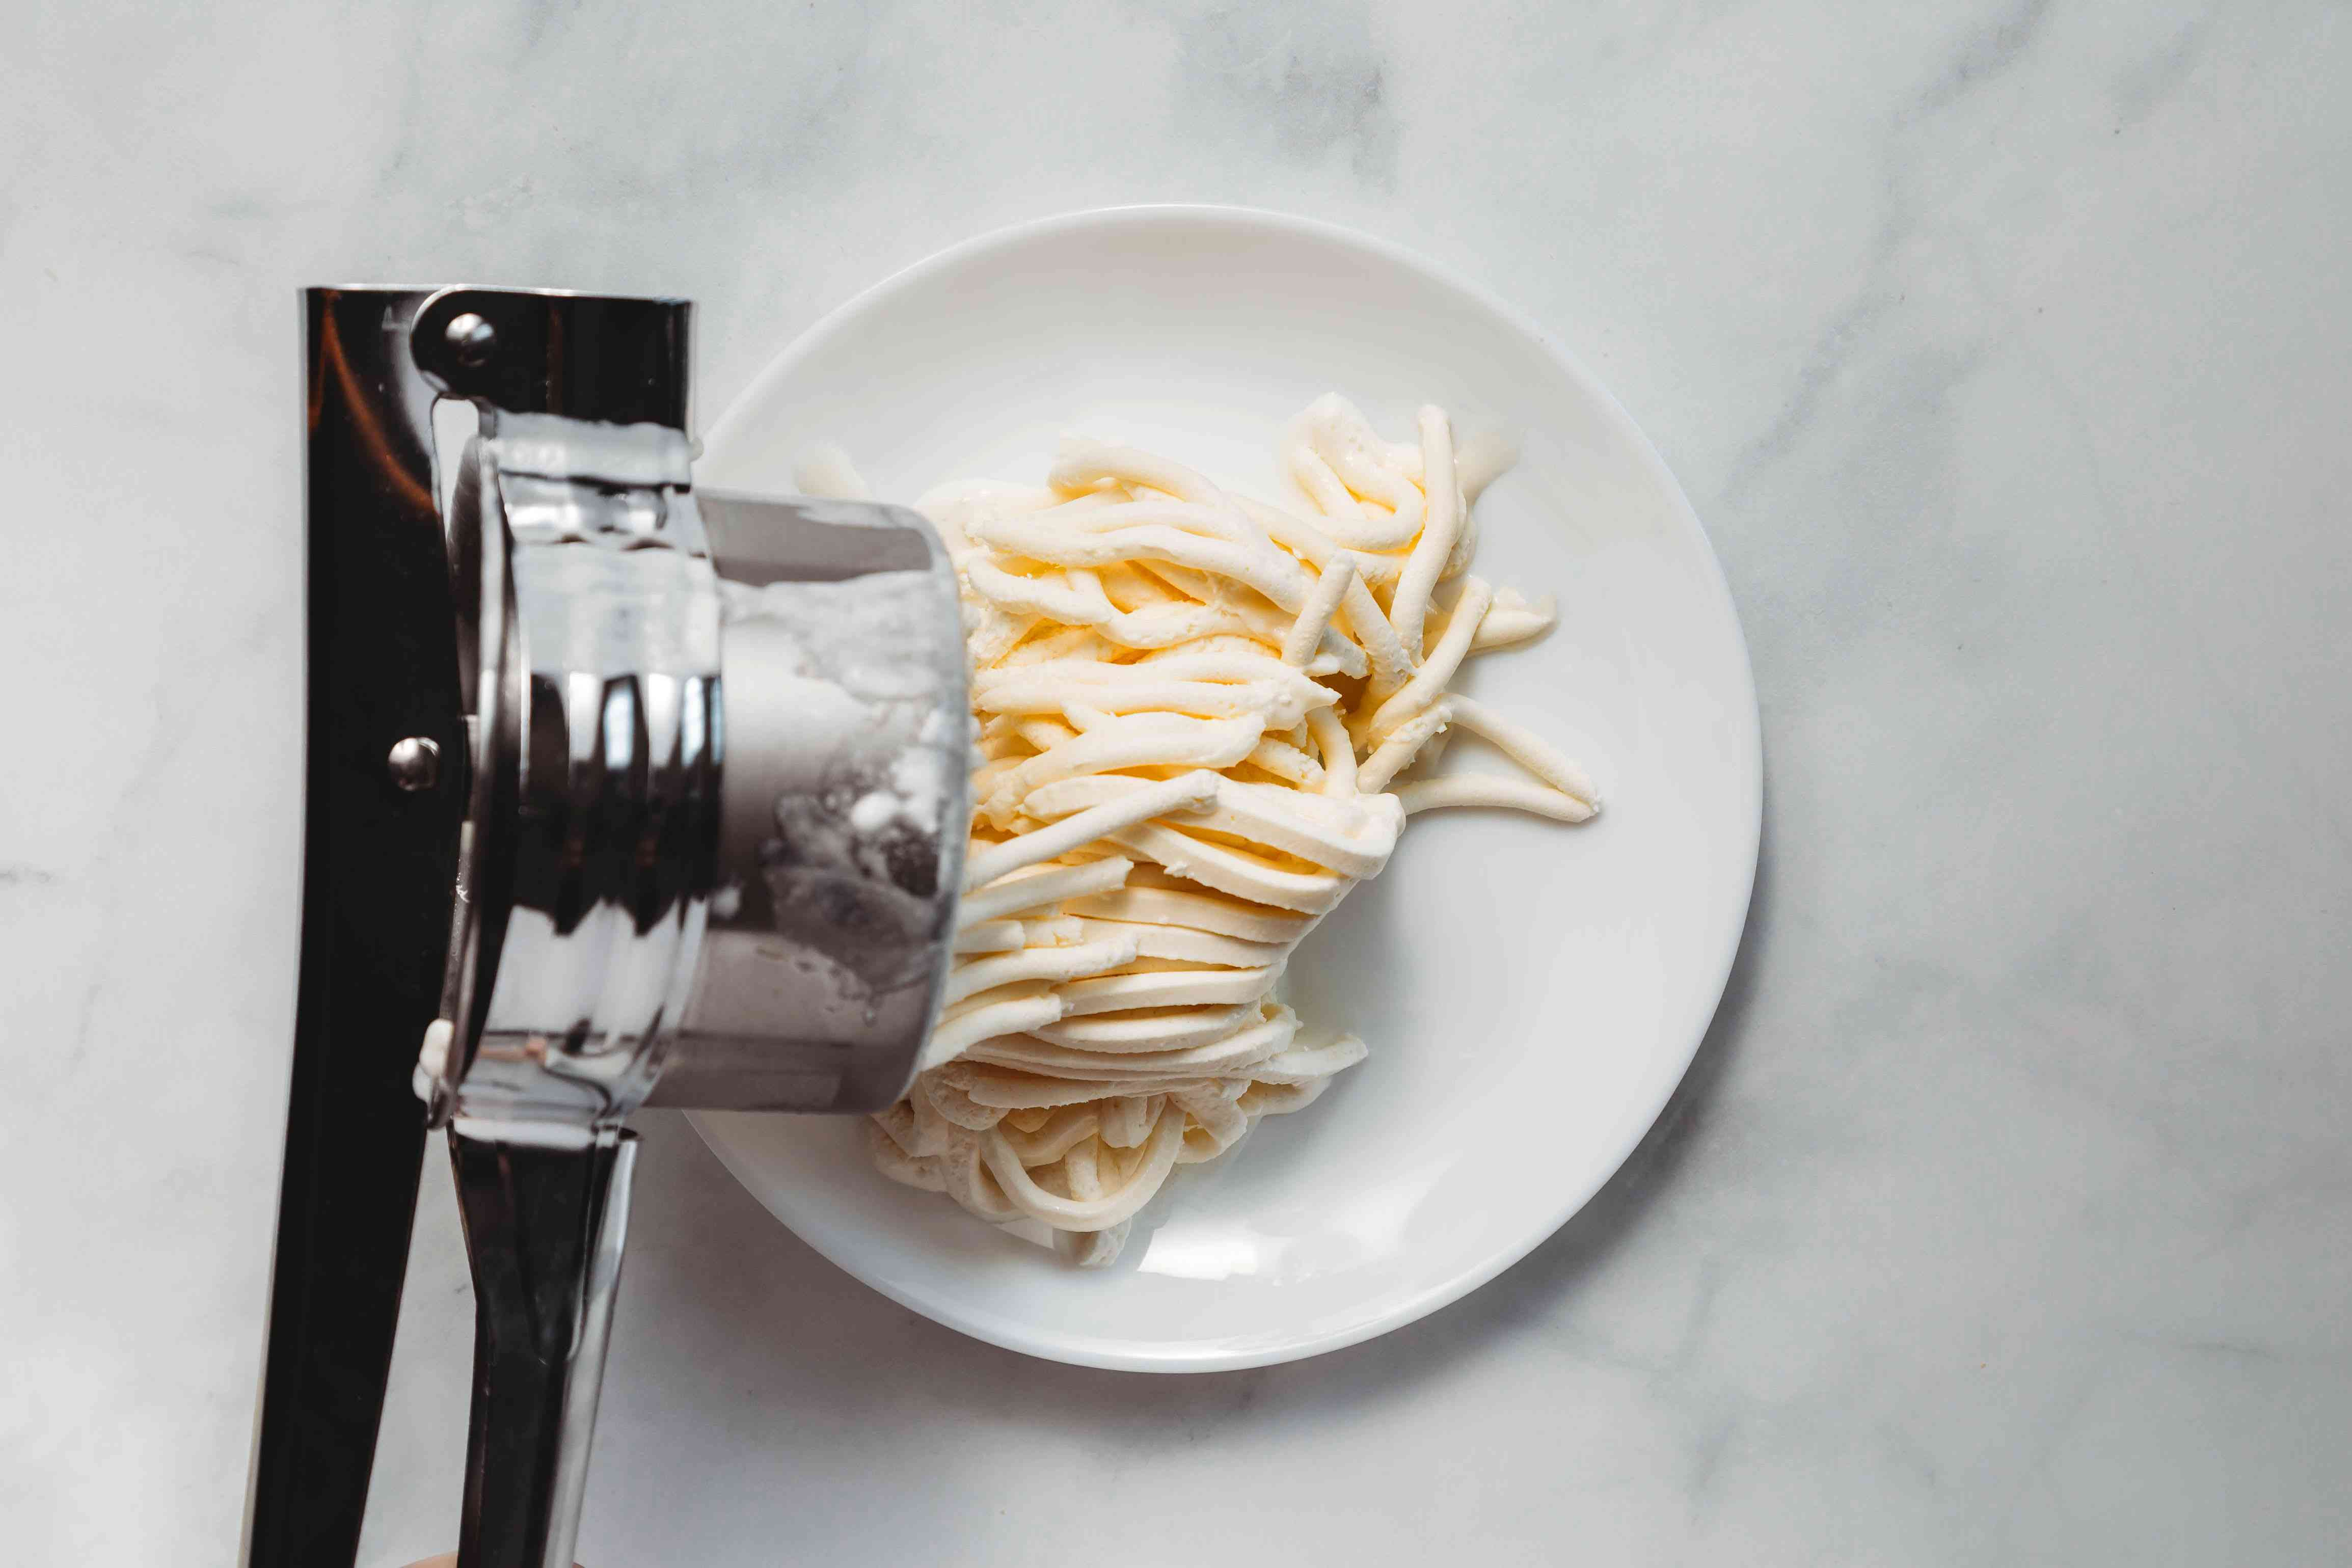 ice cream pressed through the potato ricer